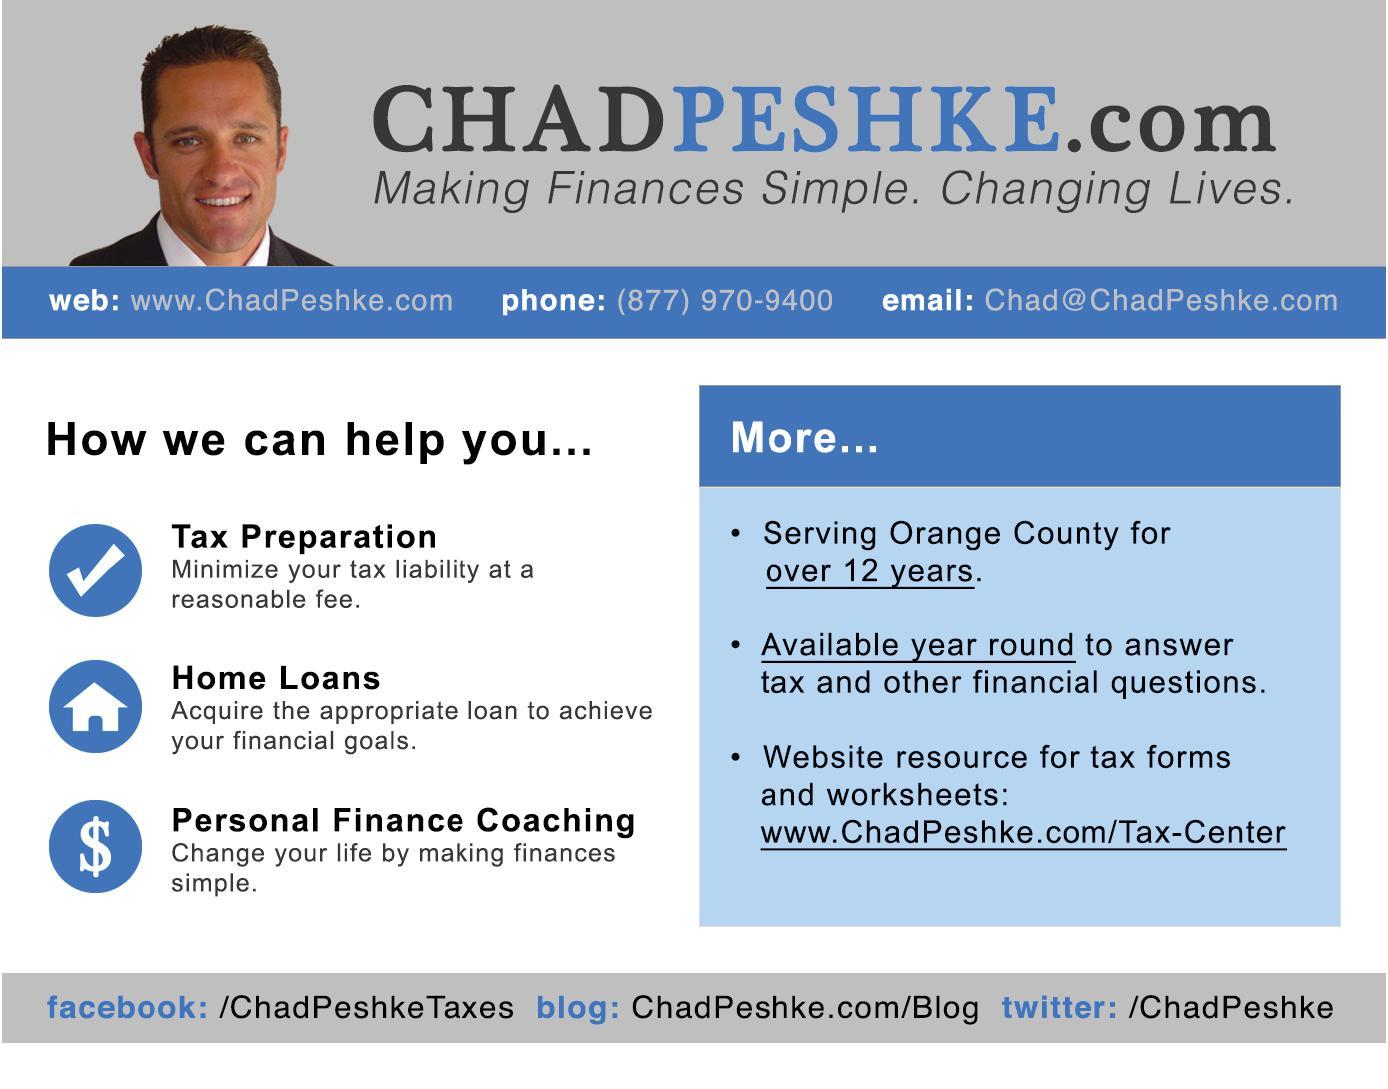 ChadPeshke.com